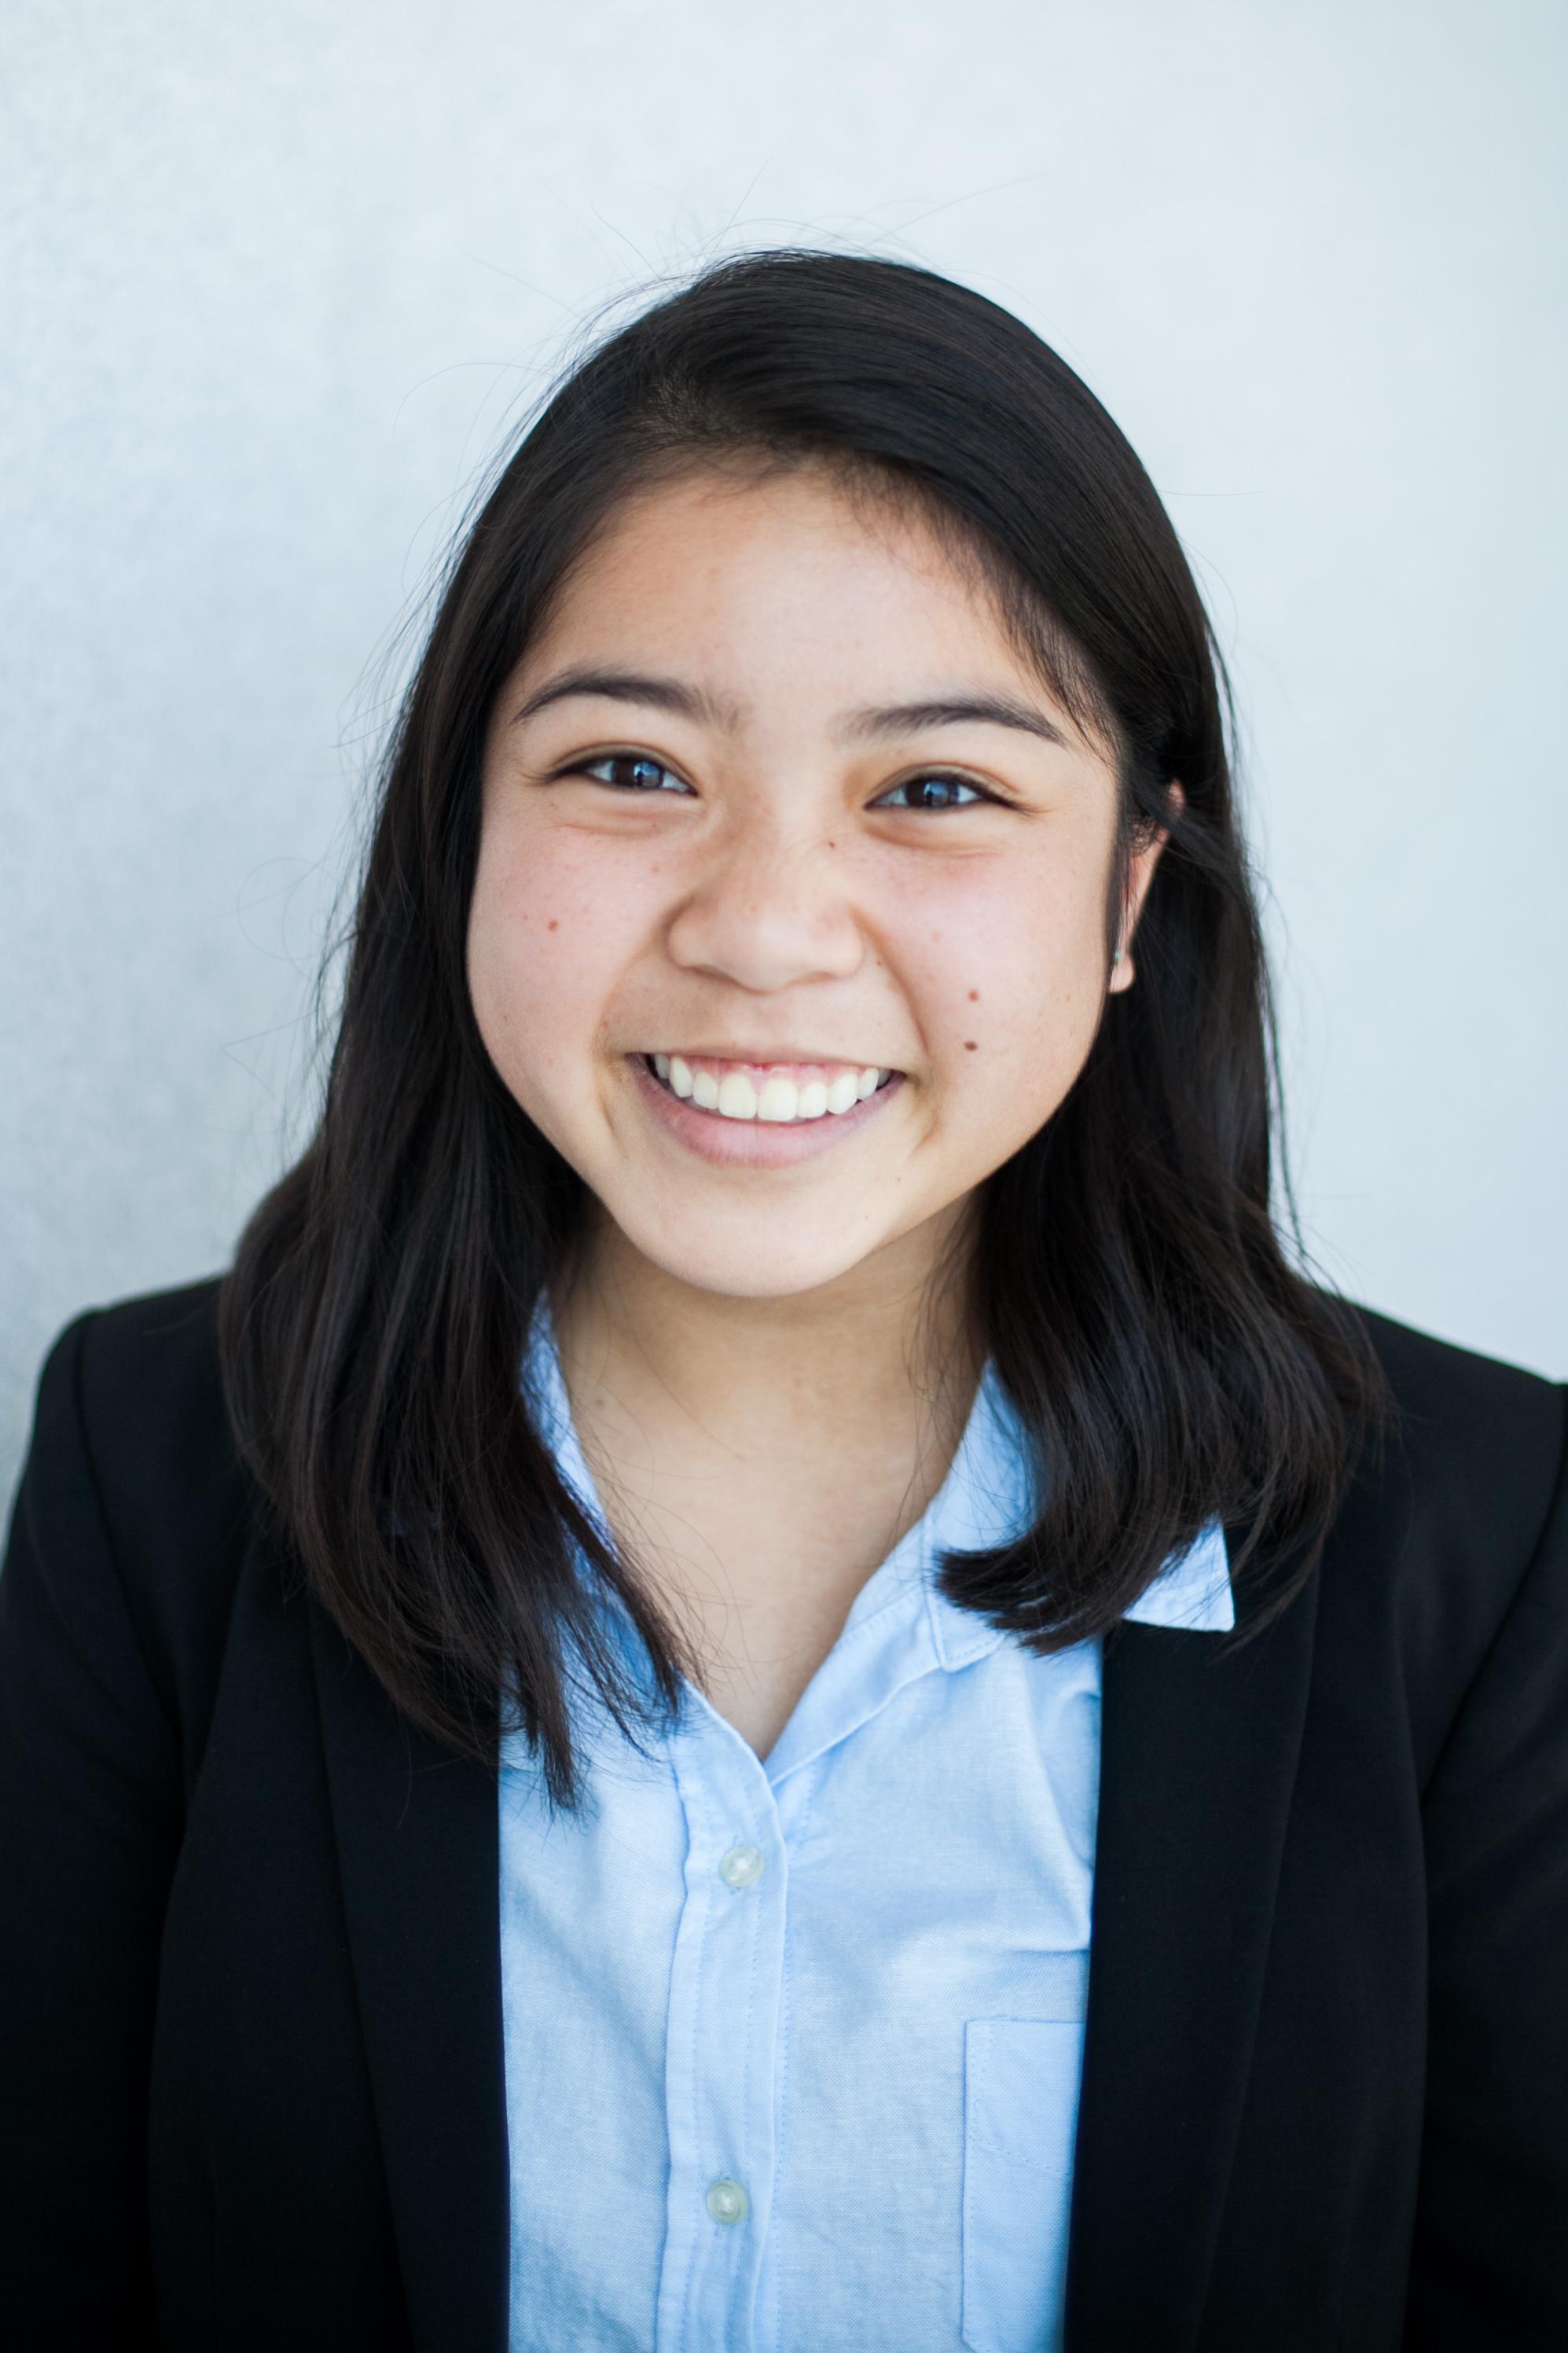 Kelly Zheng, 2016, McKinley